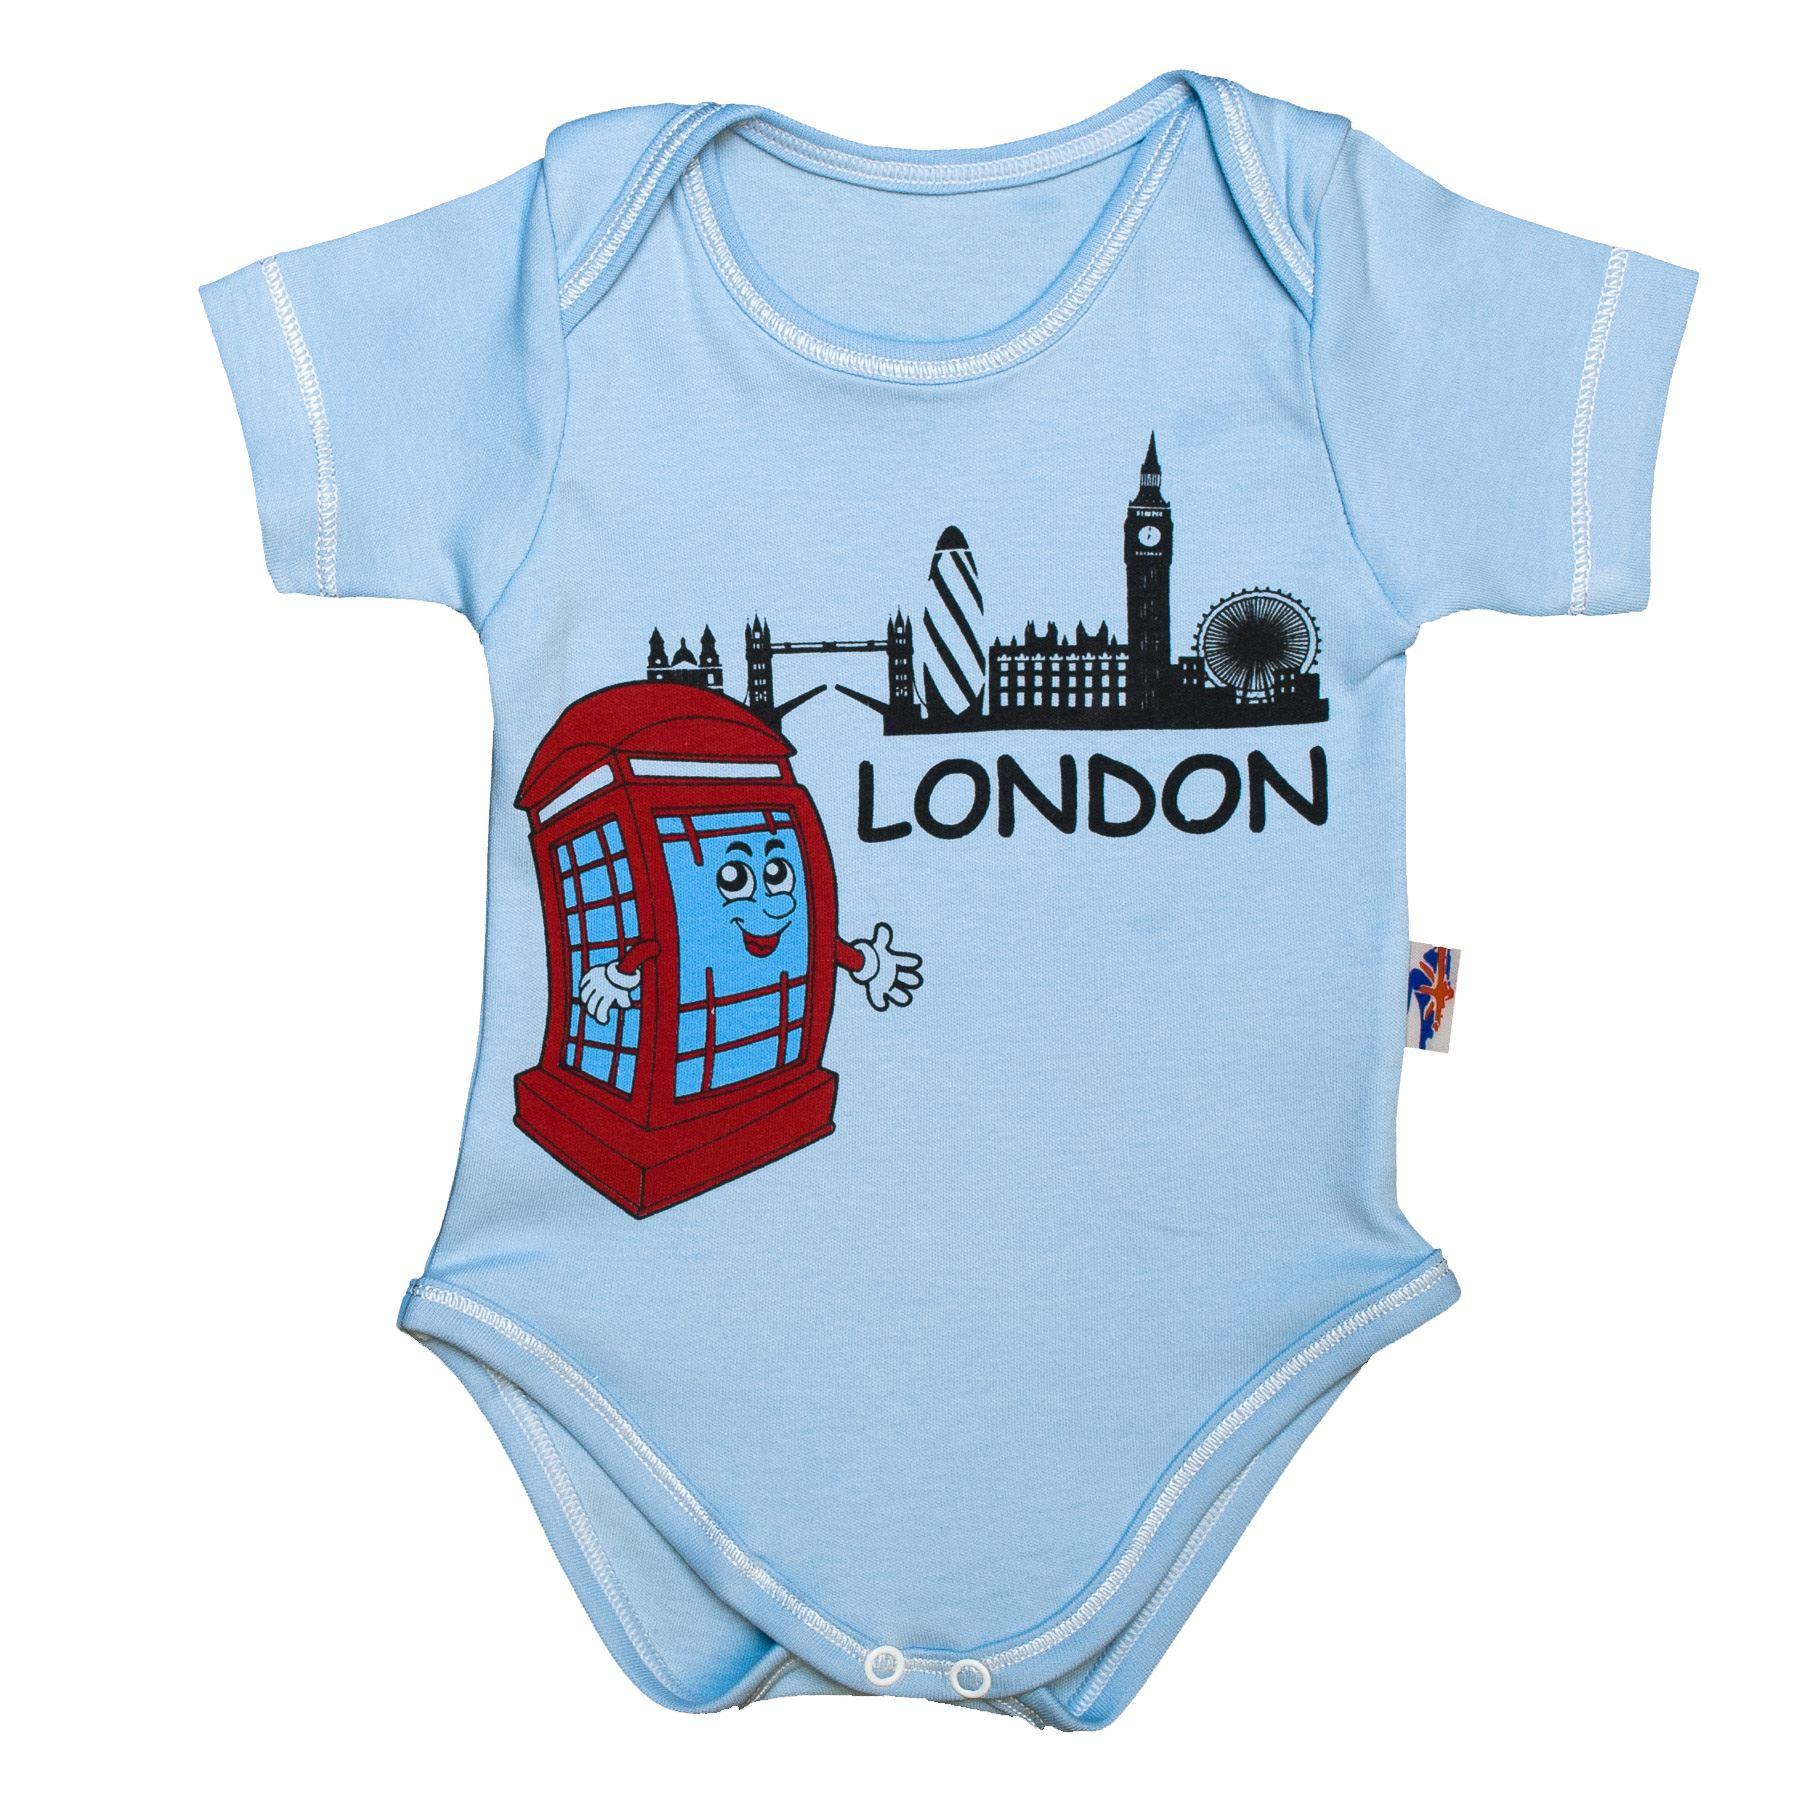 Newborn Baby Toddler Souvenir Body Suit